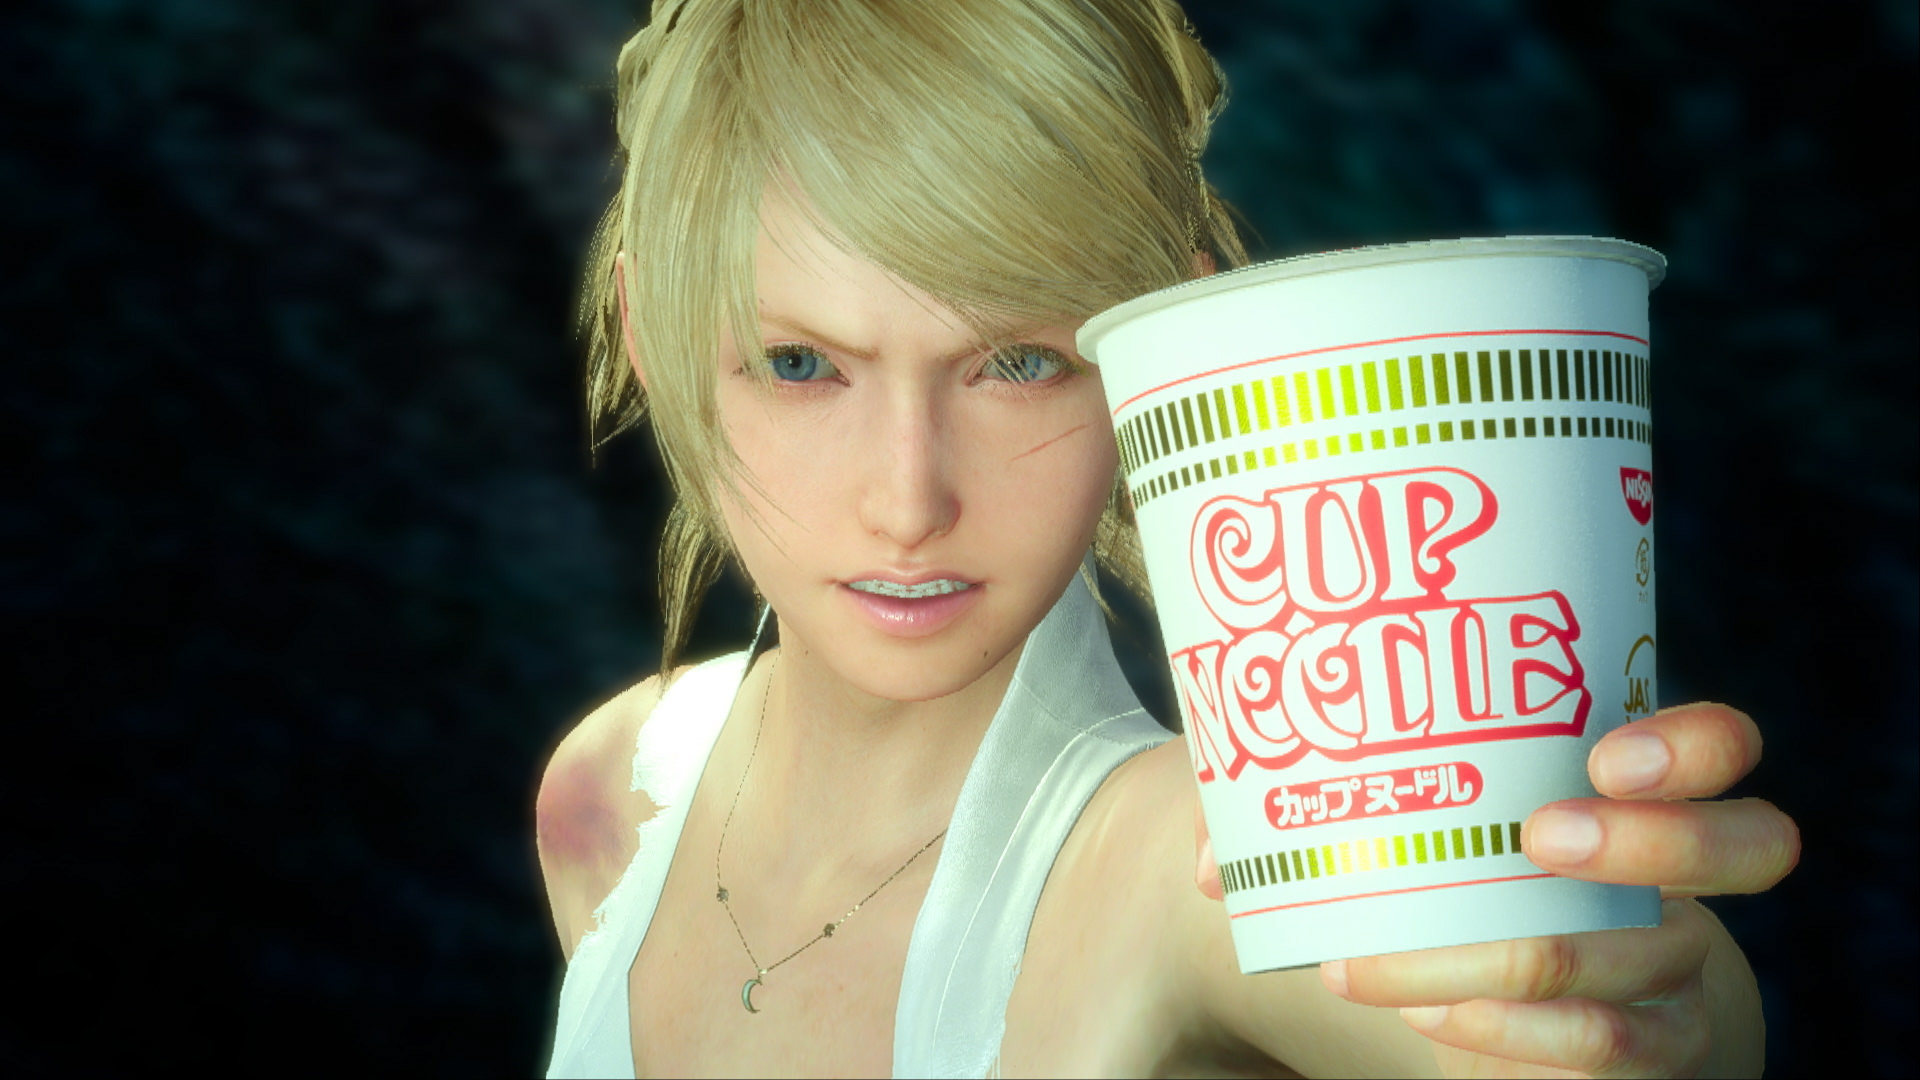 Cup noodle xv 4